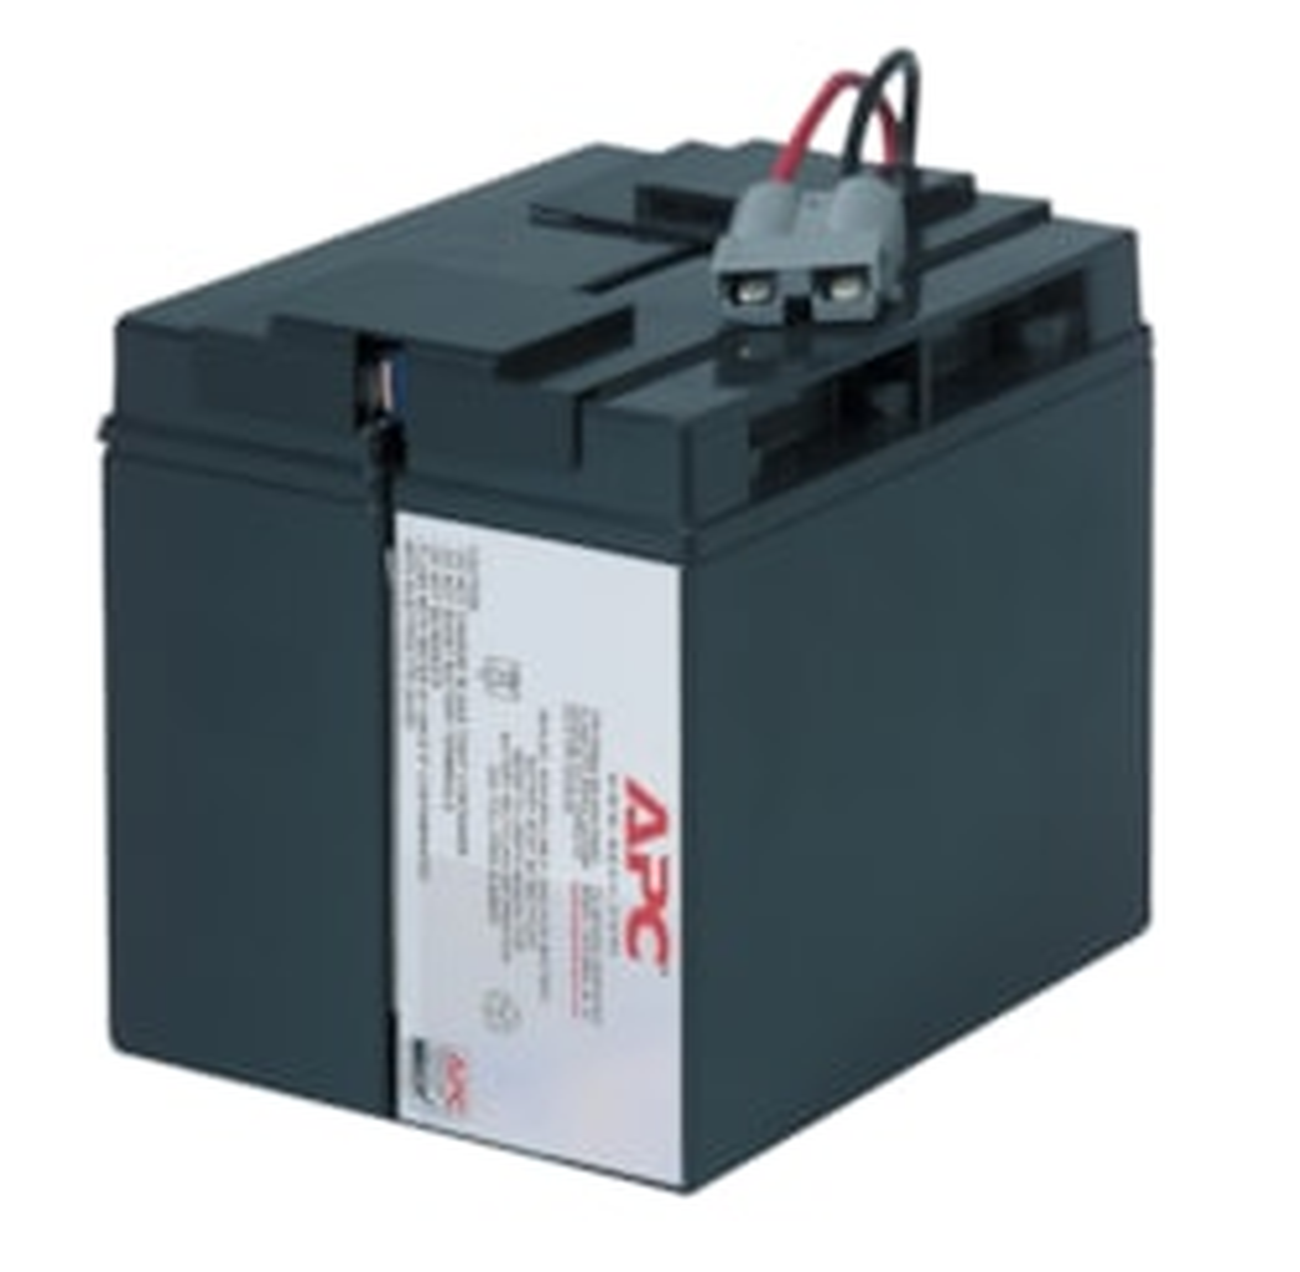 APC by Schneider Electric RBC7 Battery Unit